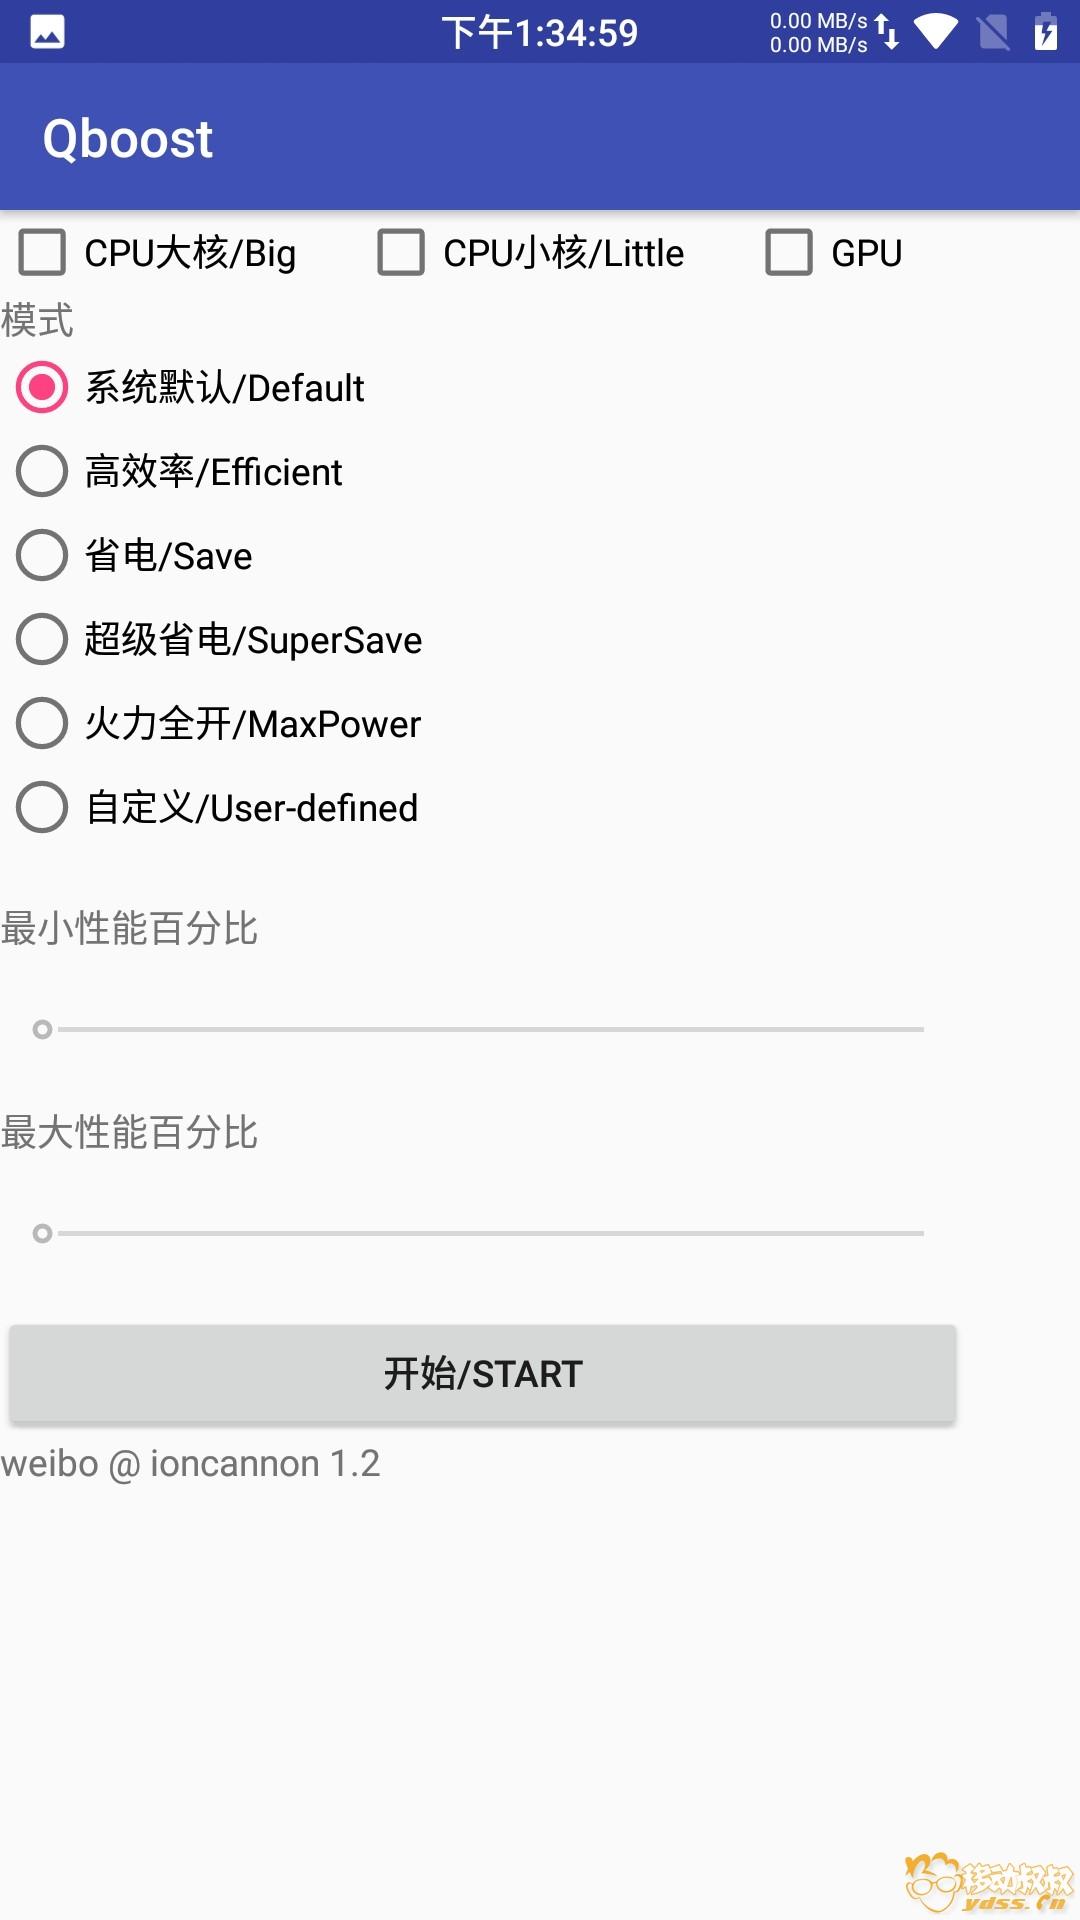 New0019Screenshot_Qboost_20180913-133500.jpg